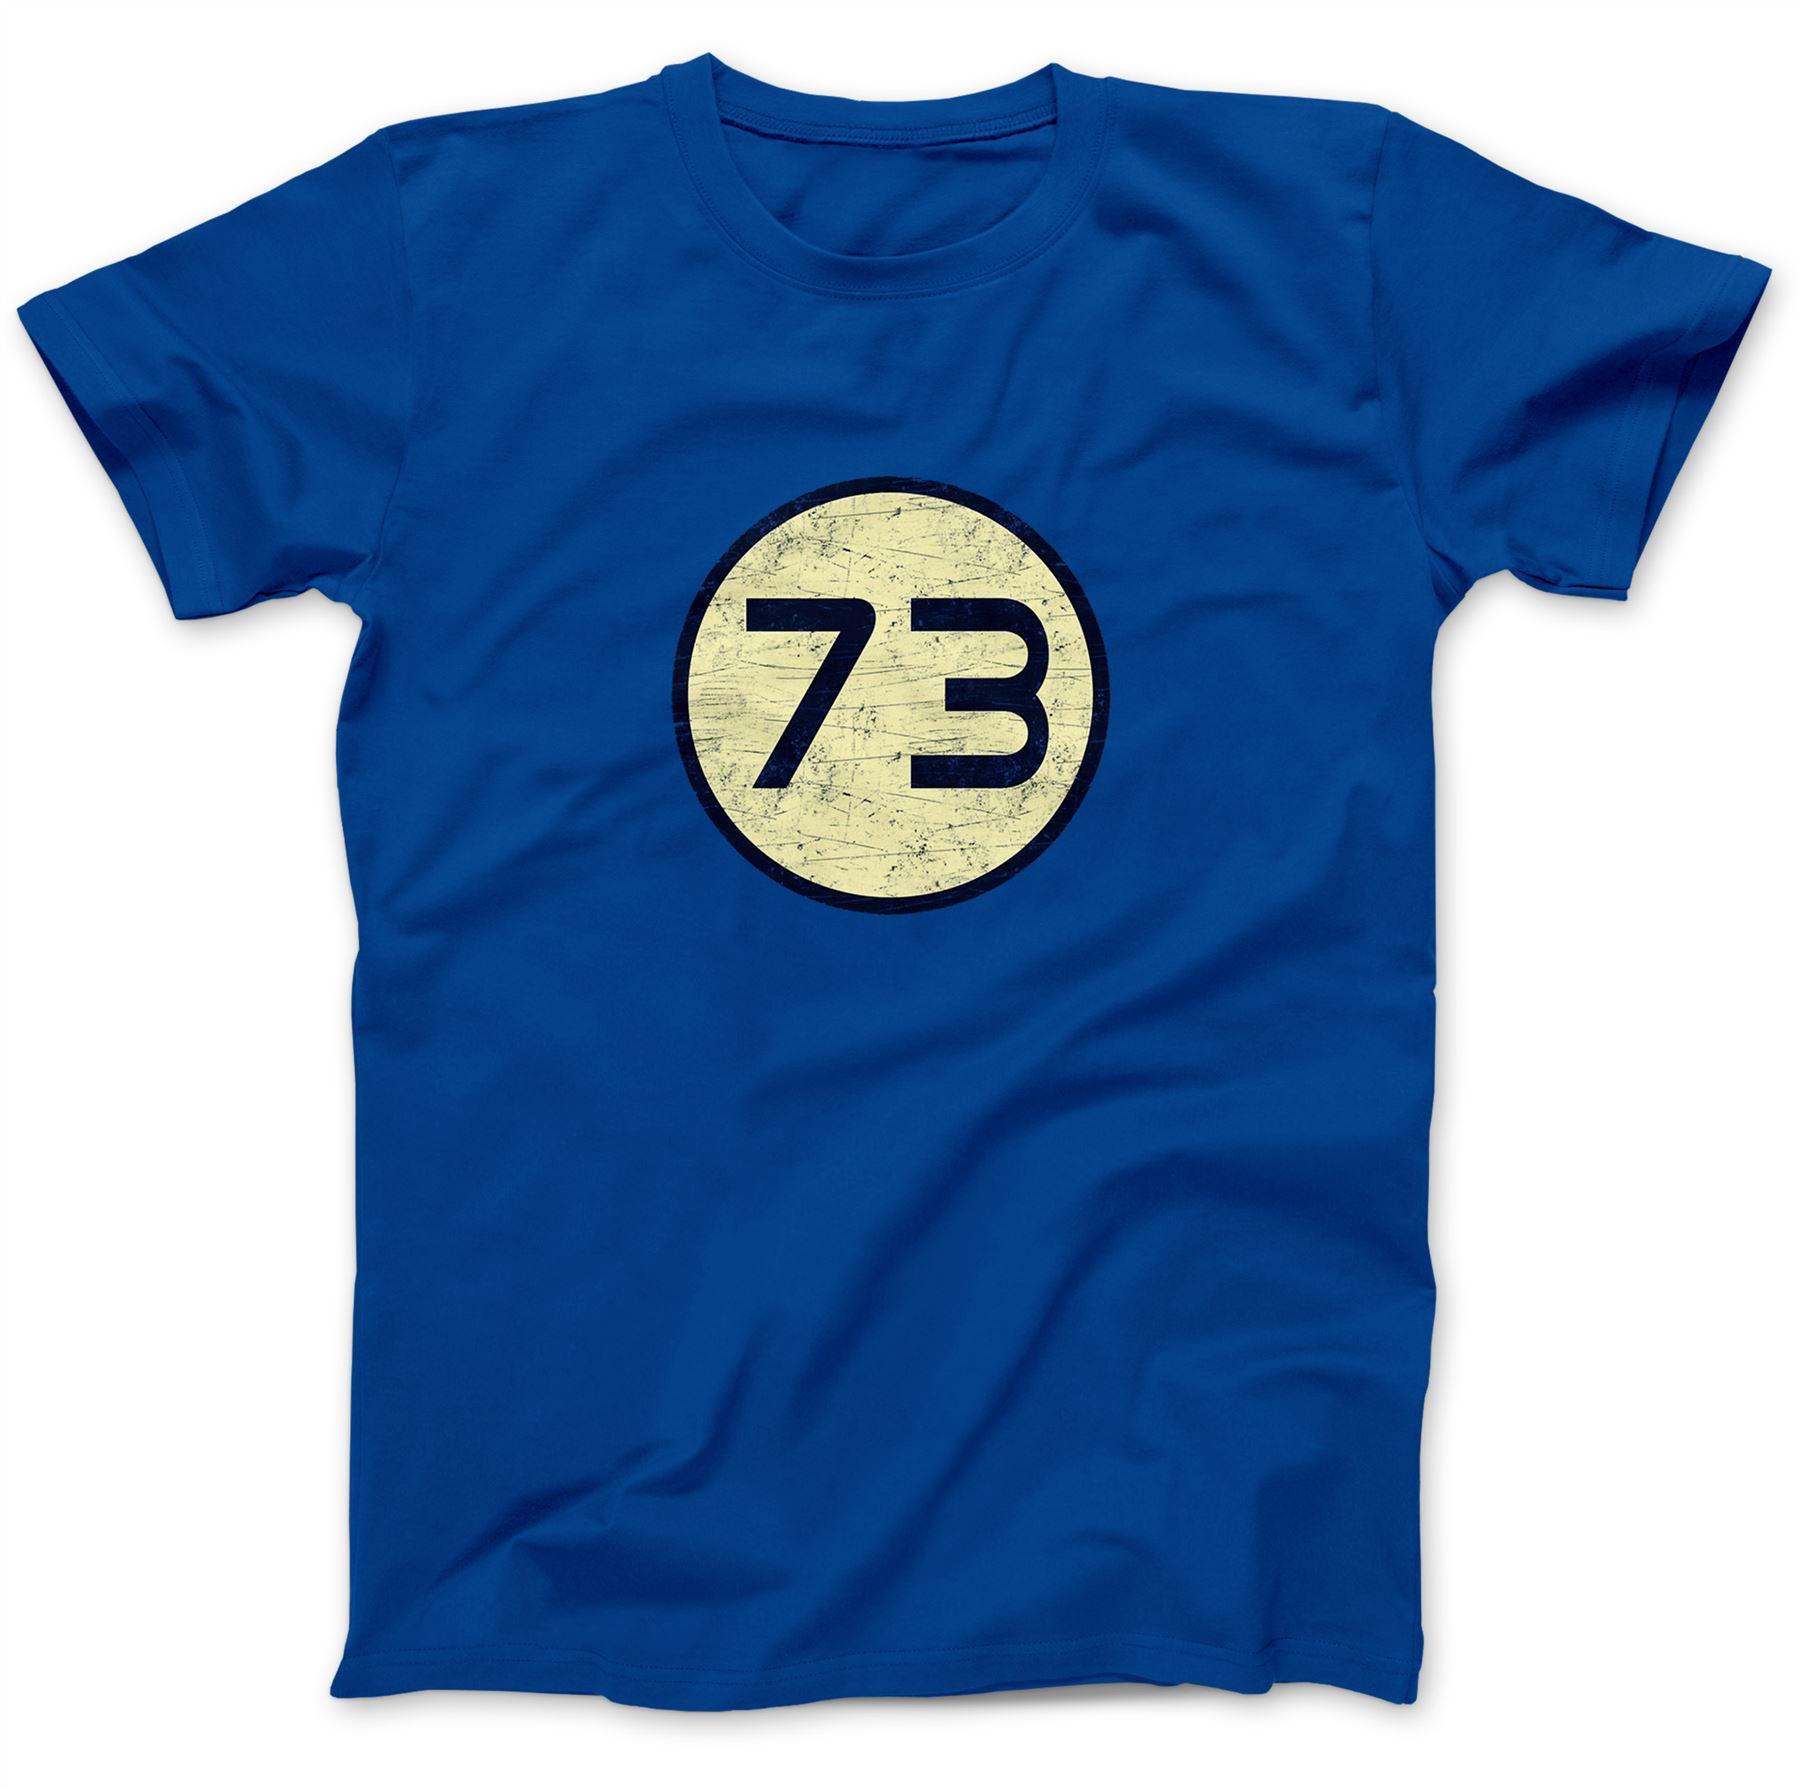 Number 73 T-Shirt 100/% Premium Cotton Sheldon